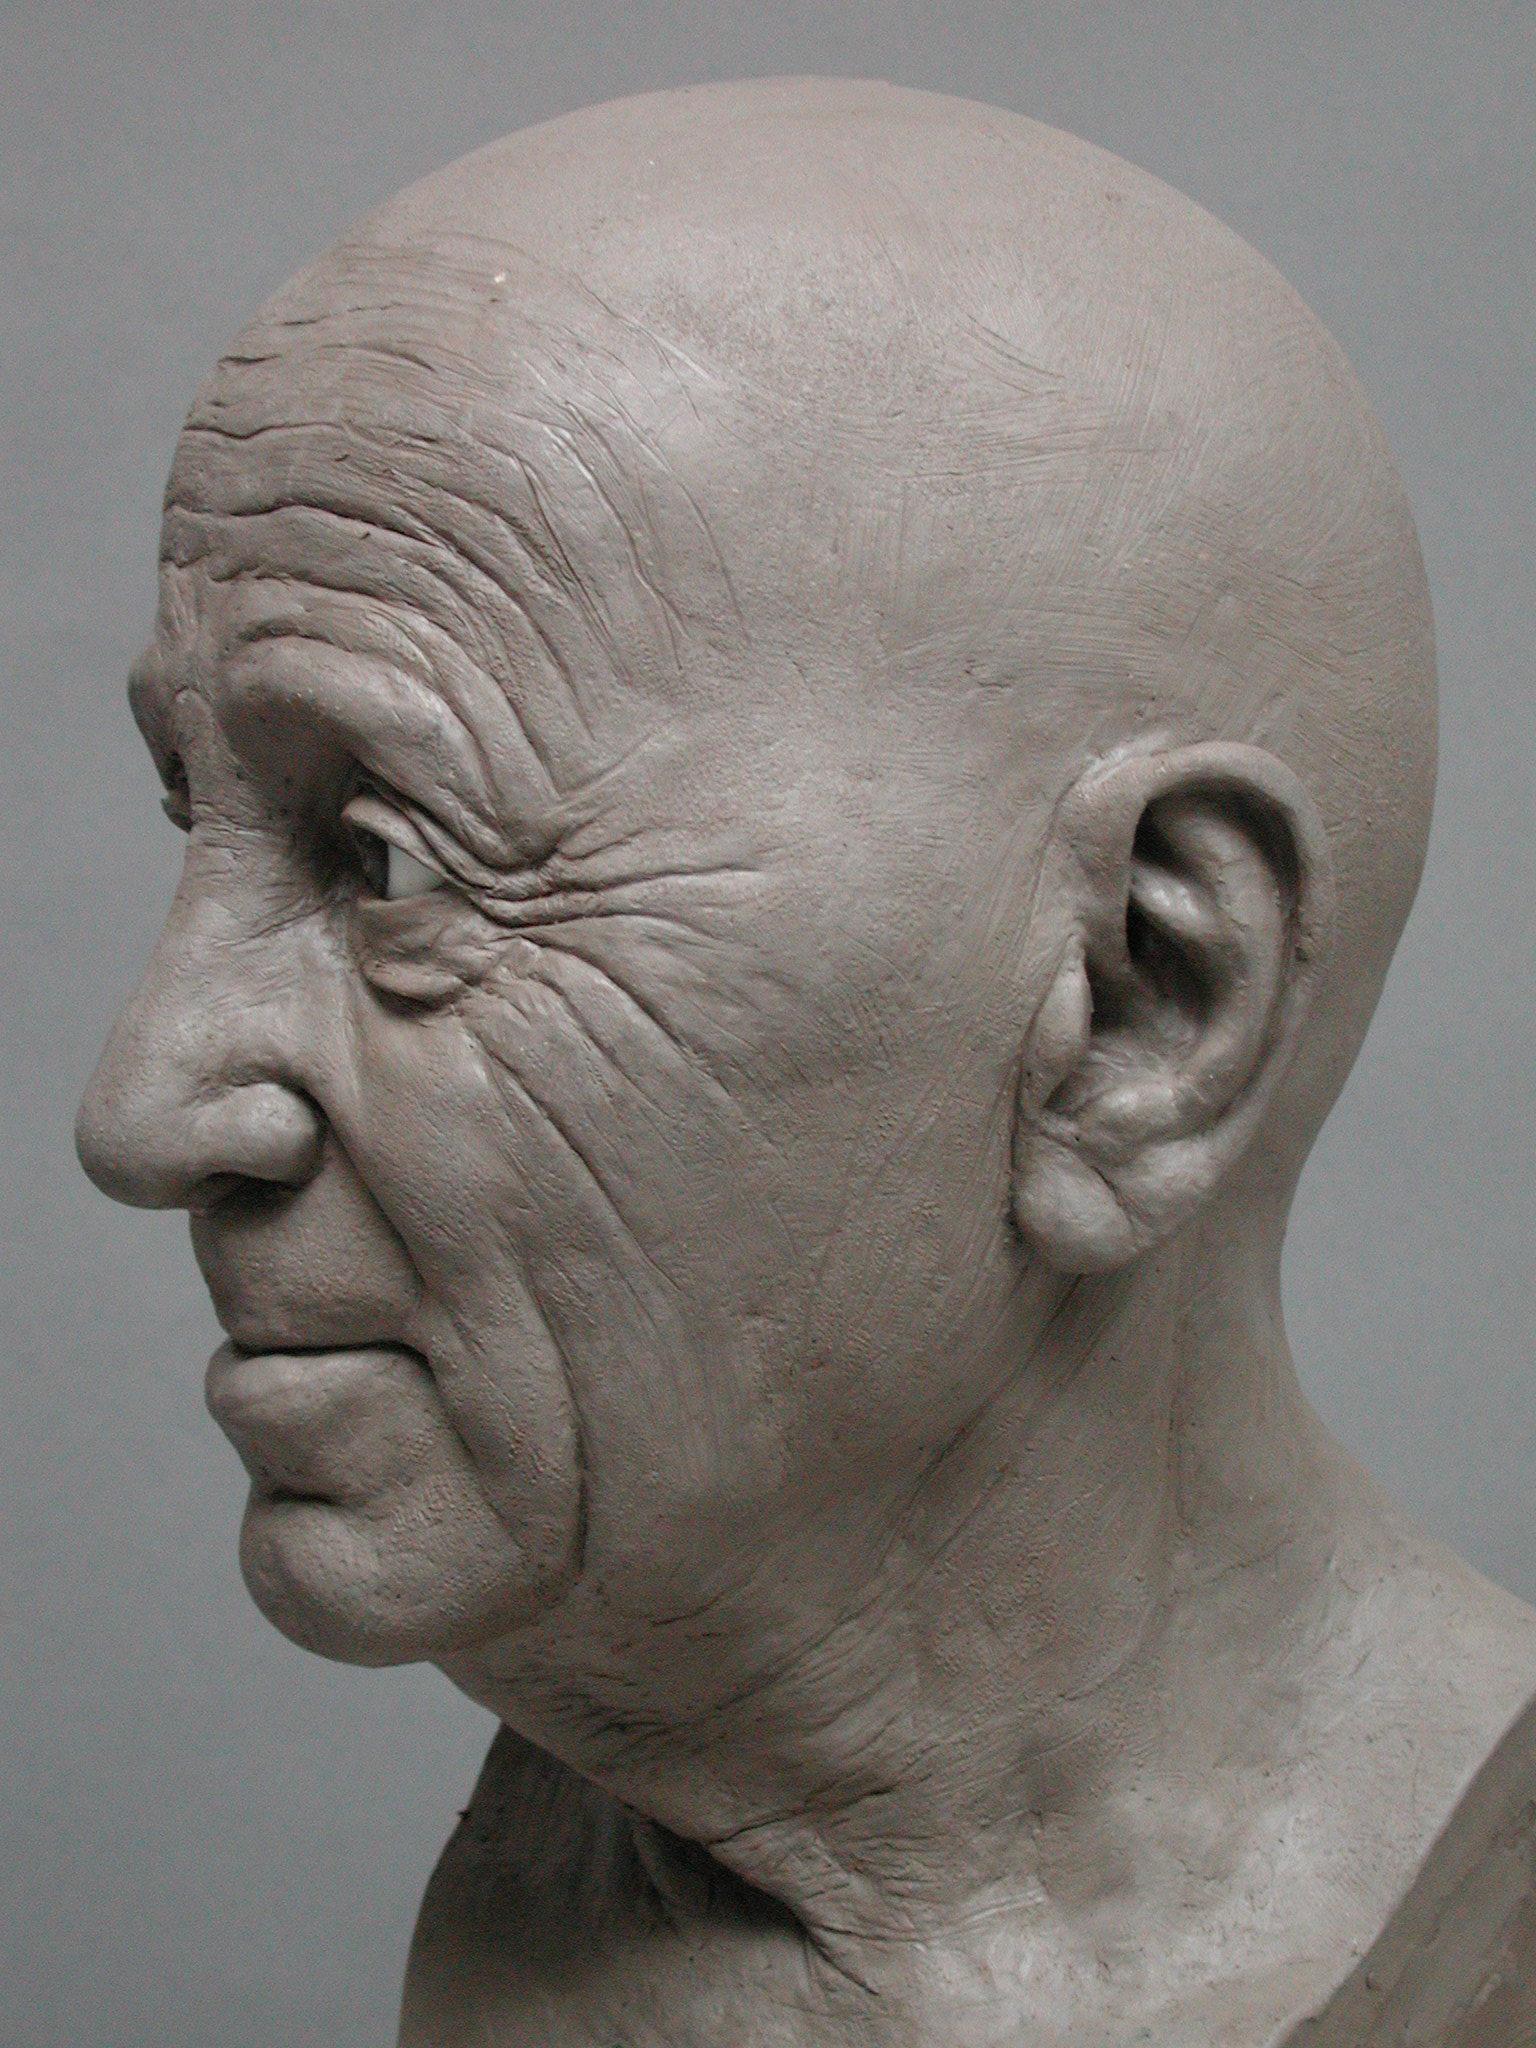 Charles Aznavour - Clay sculpture by Eric Saint Chaffray - Credit Musée Grévin